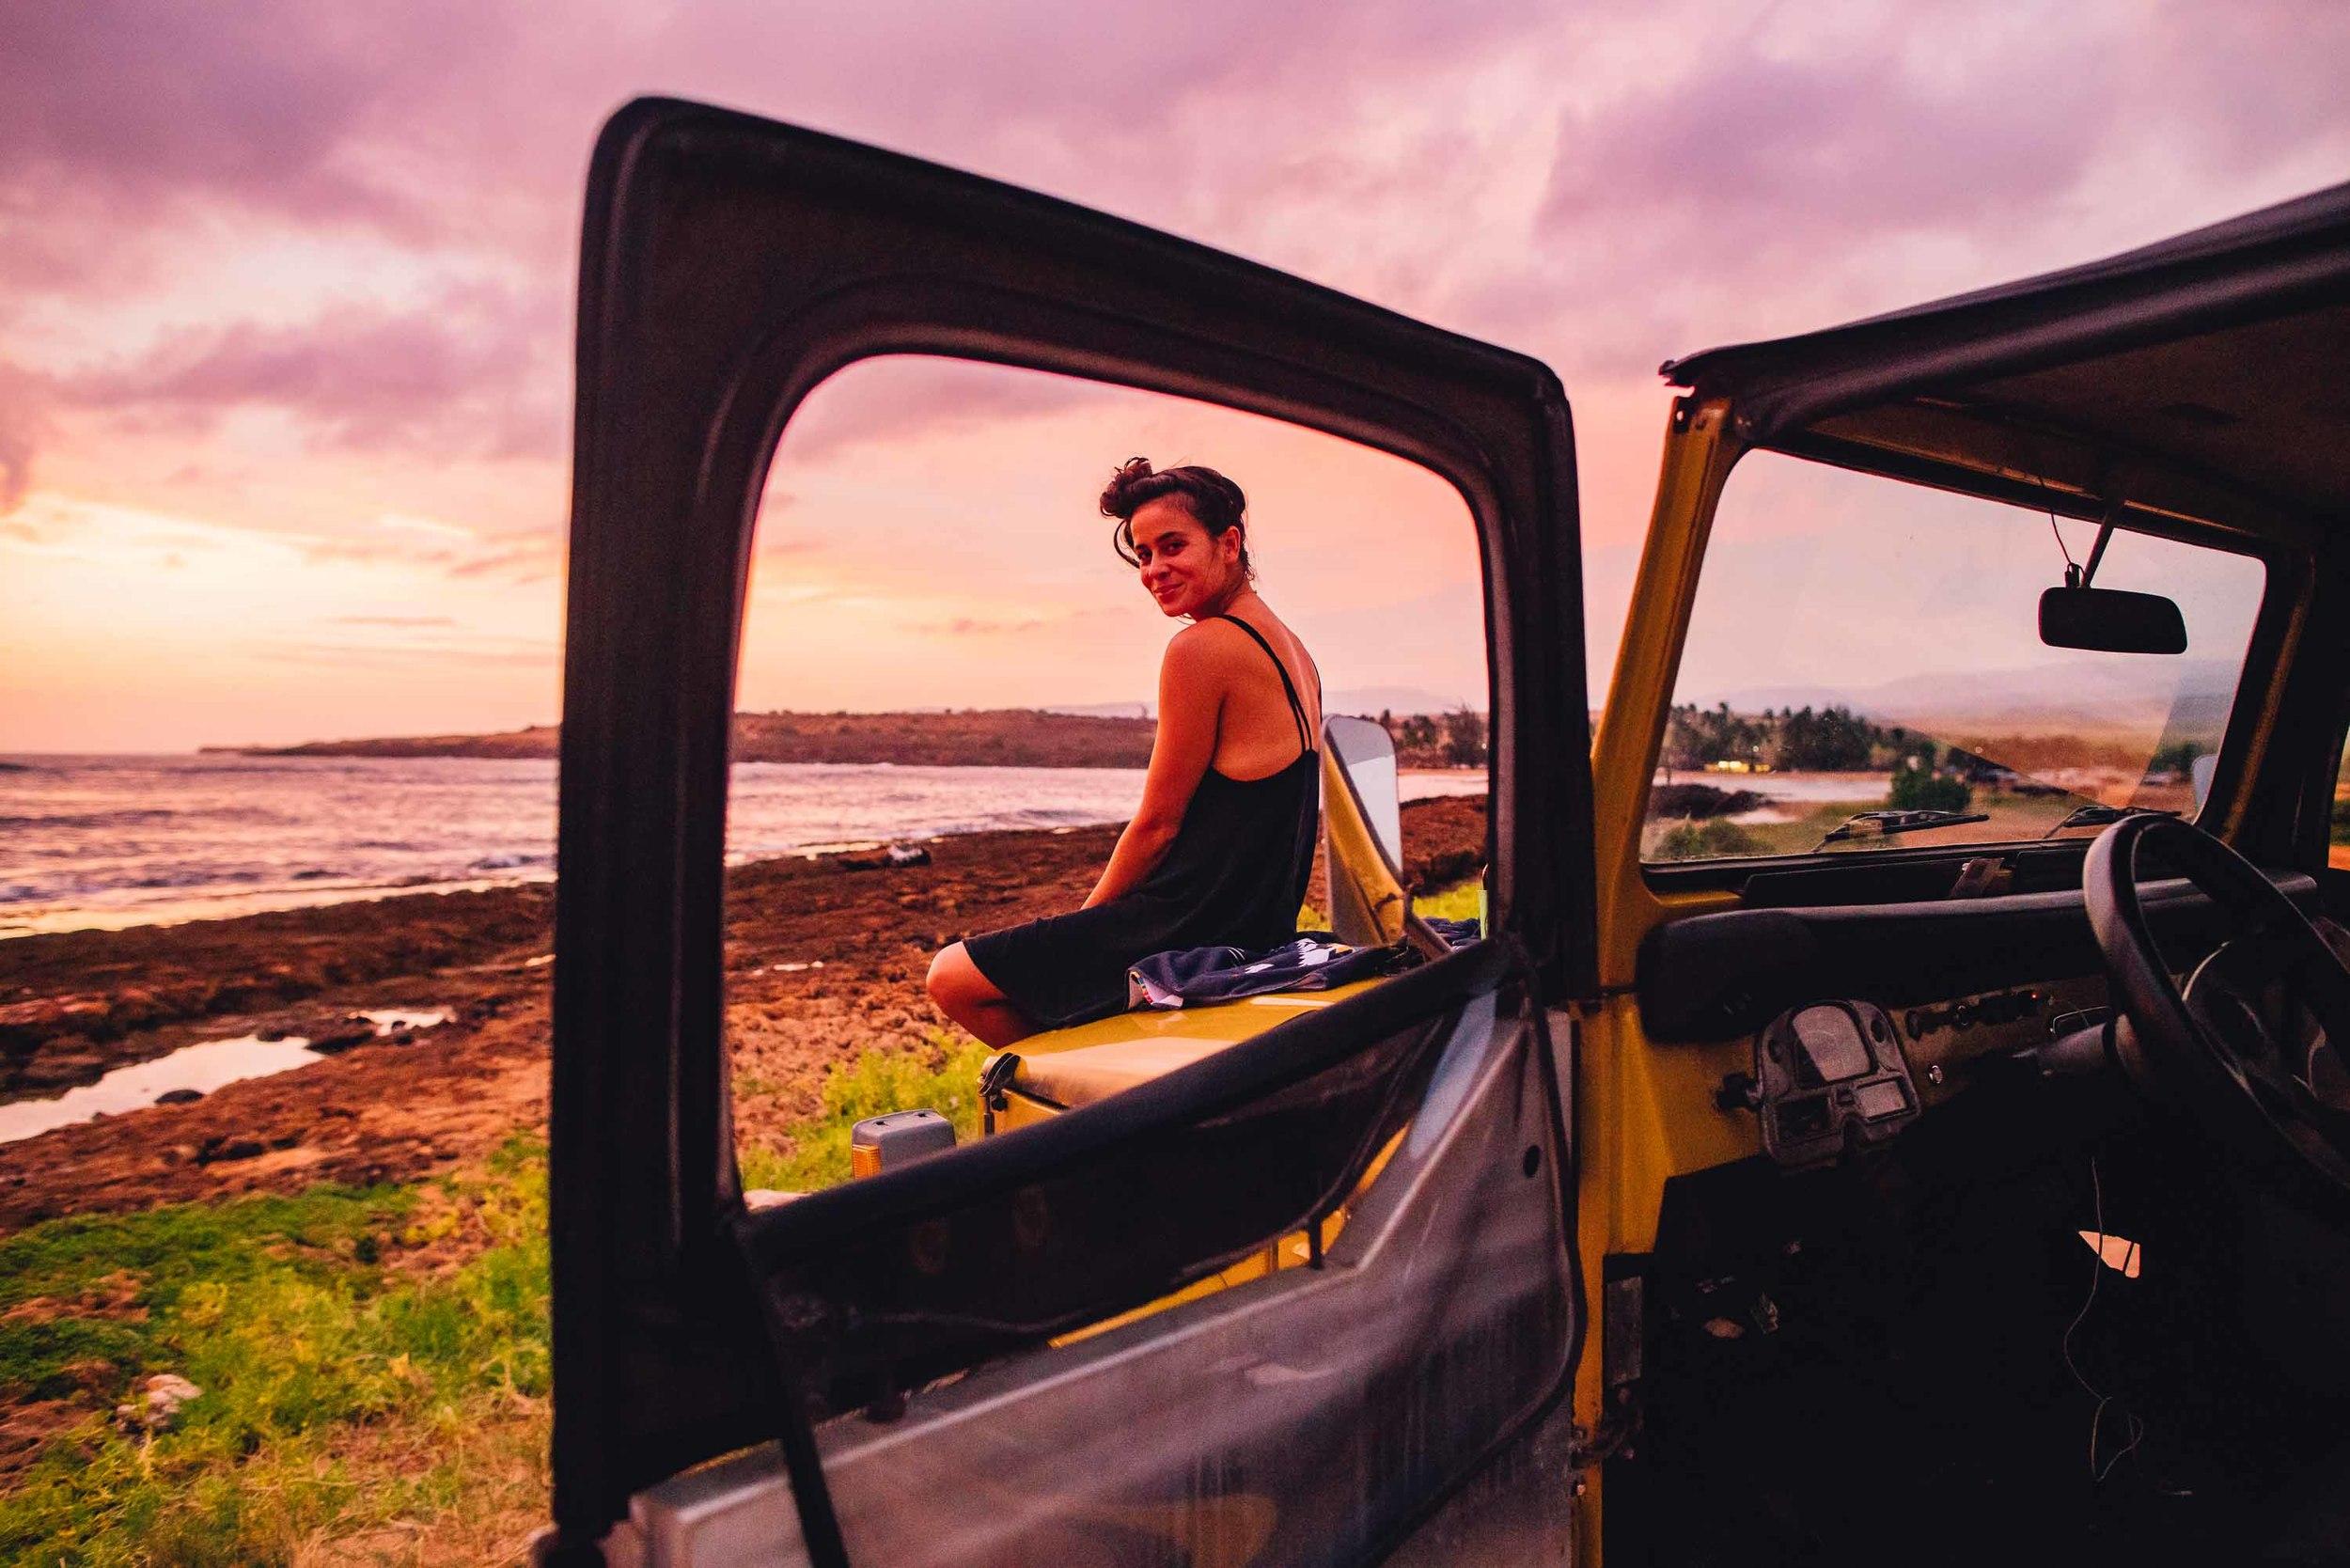 bryce-johnson-kauai-fj40-toyota-landcruiser-aloha exchange-slowtide-20.jpg